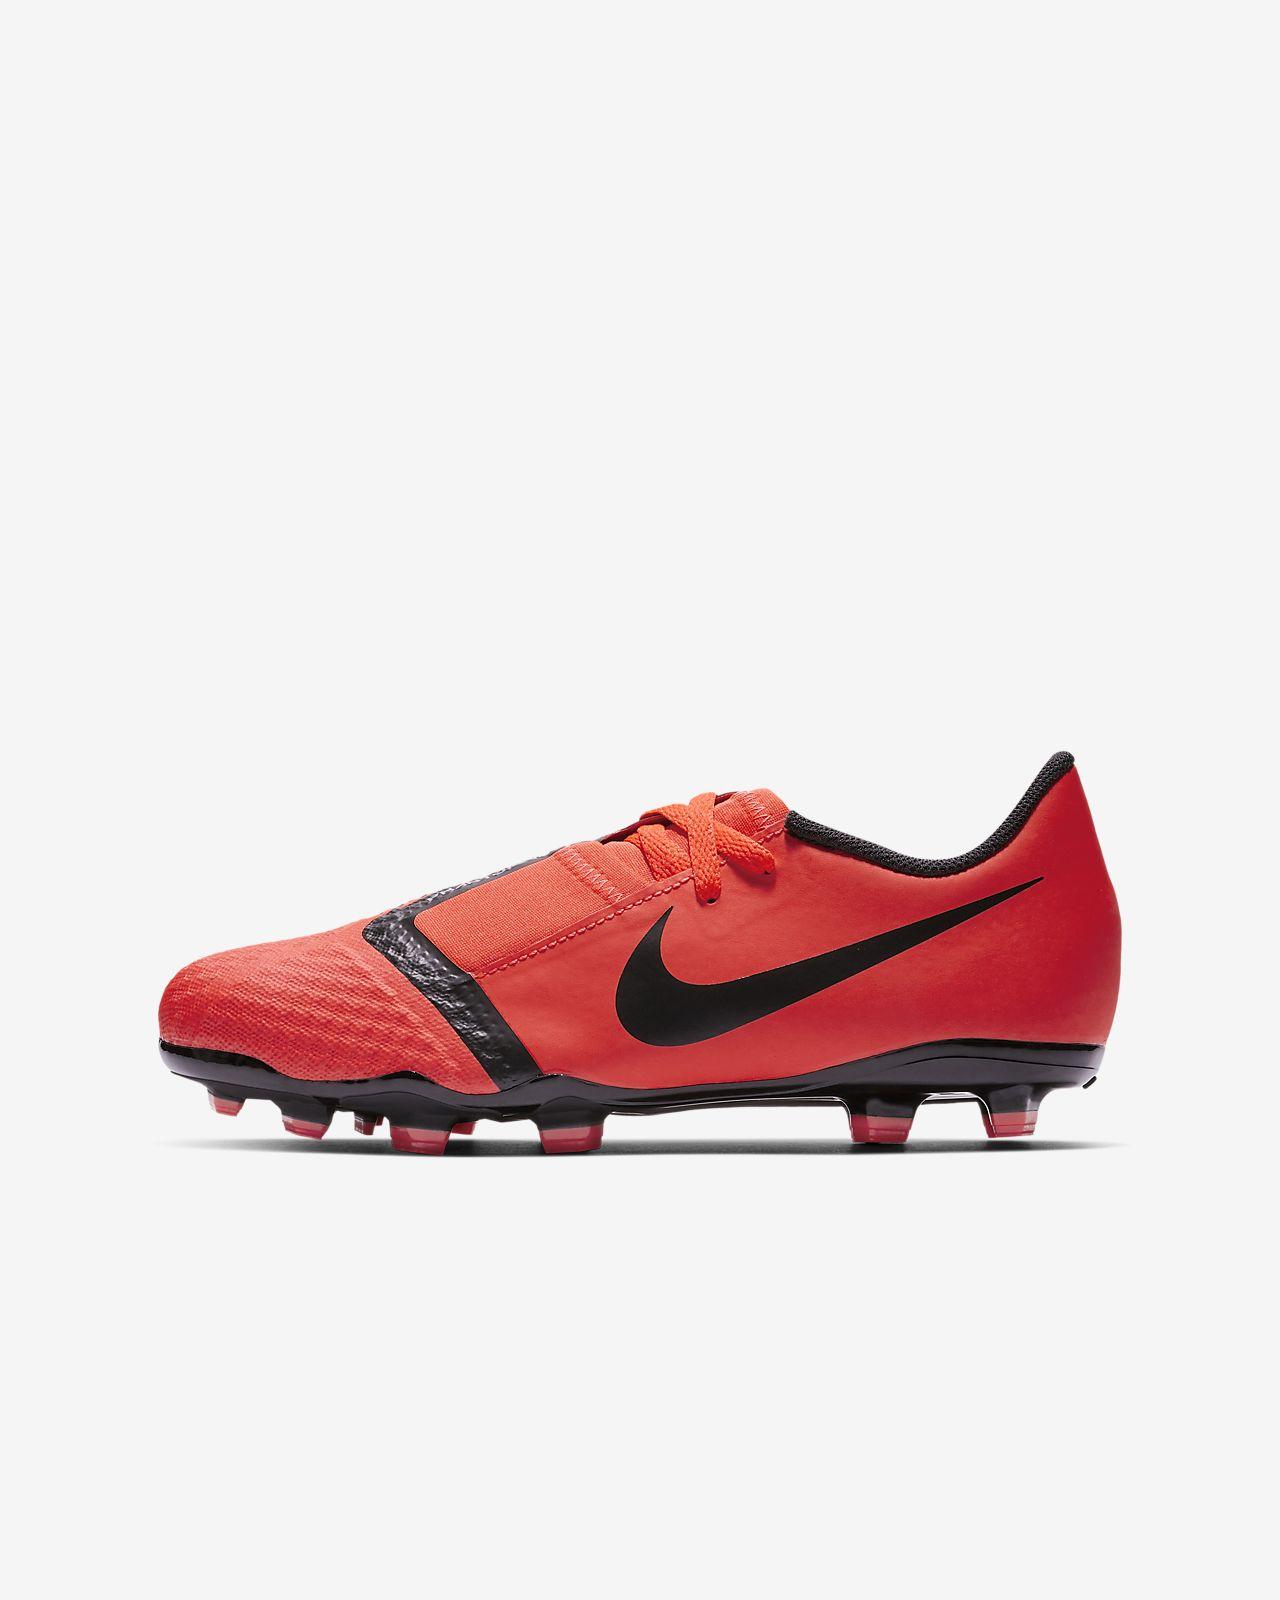 Scarpa da calcio per terreni duri Nike Jr. PhantomVNM Academy FG Game Over - Ragazzi